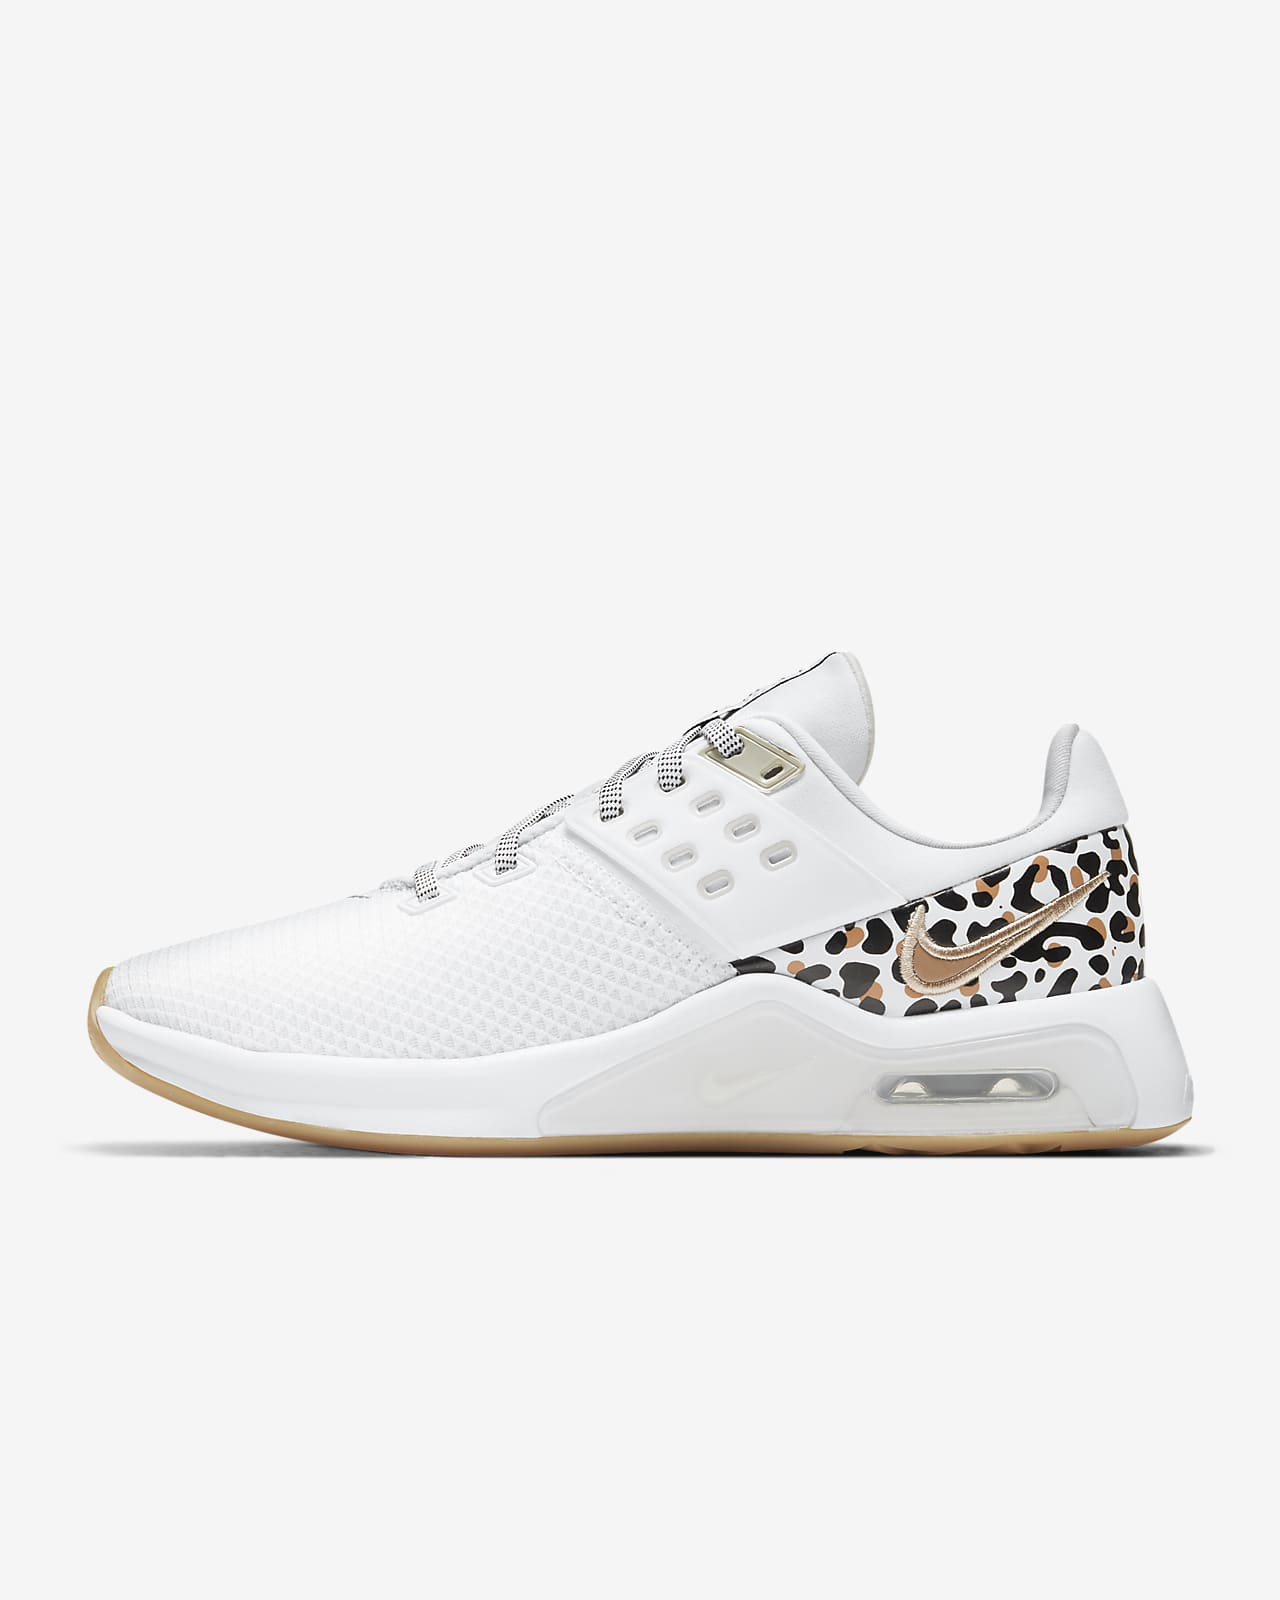 Sapatilhas de treino Nike Air Max Bella TR 4 Premium para mulher